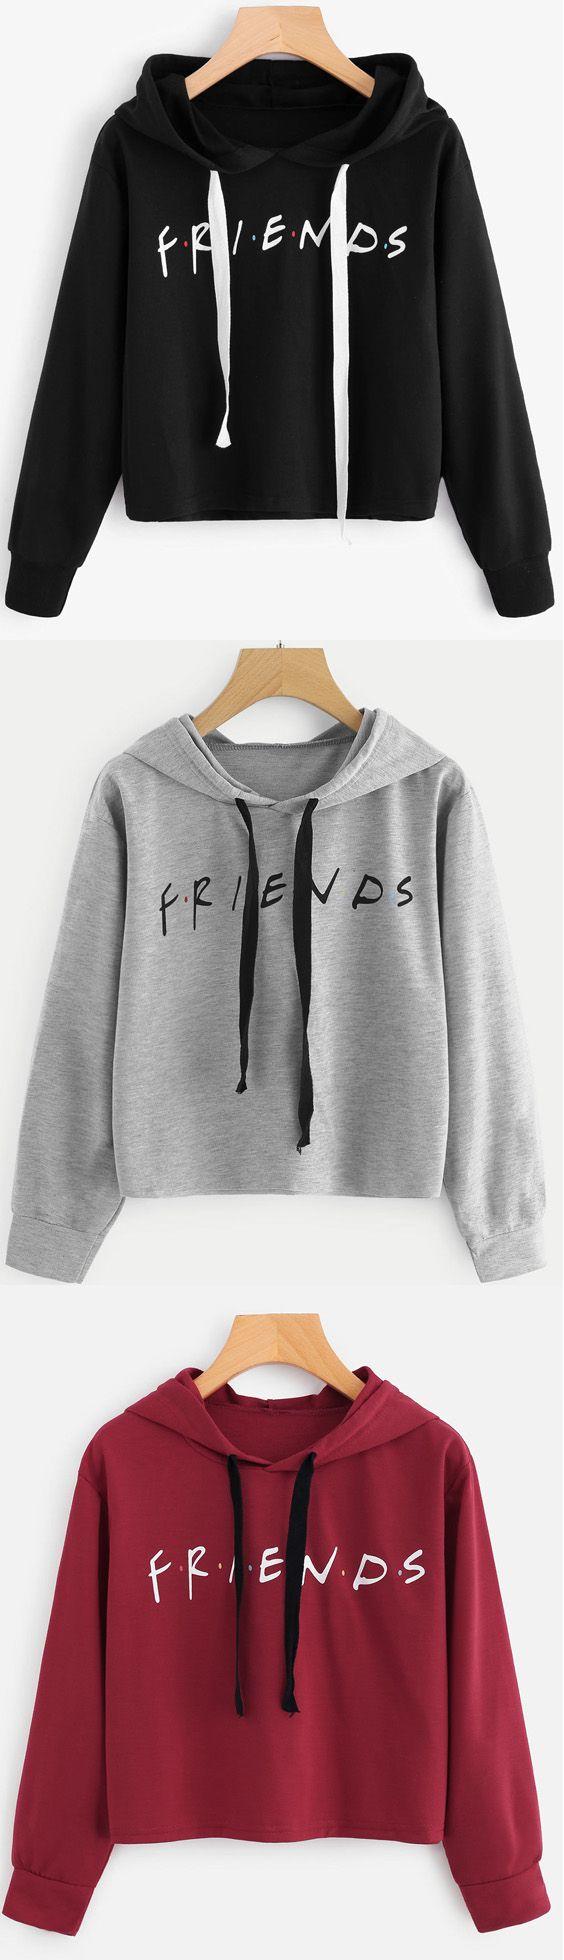 Friends Sweatshirt In White